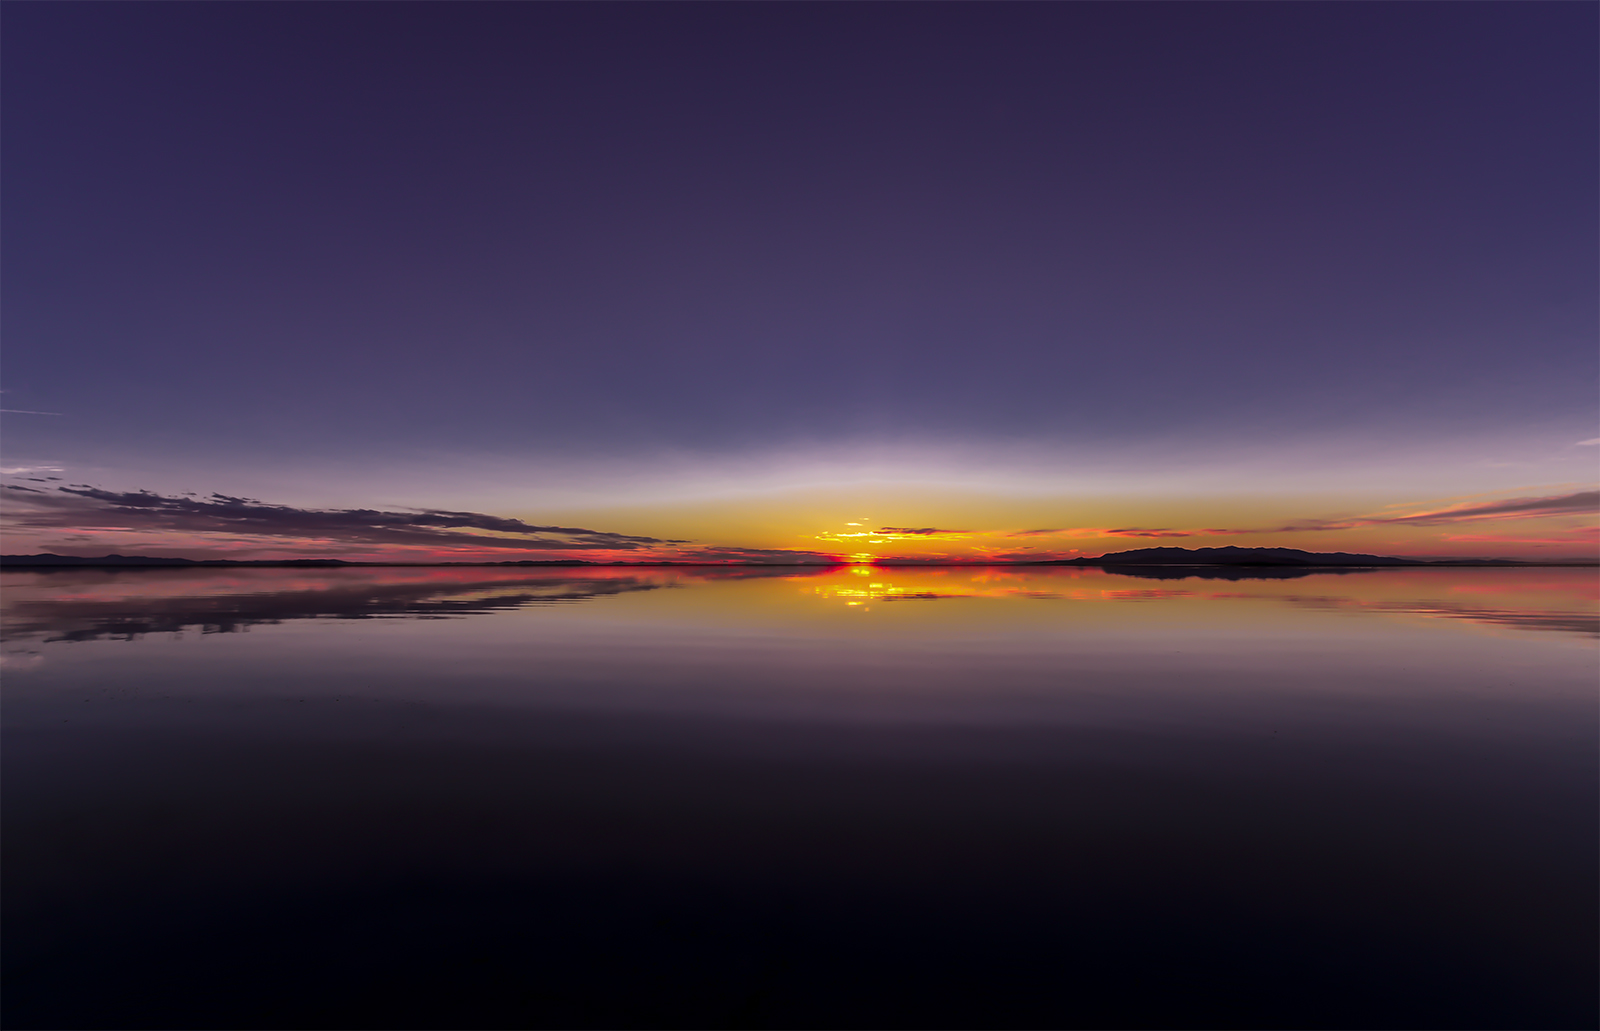 Sunset flash over the Great Salt Lake.